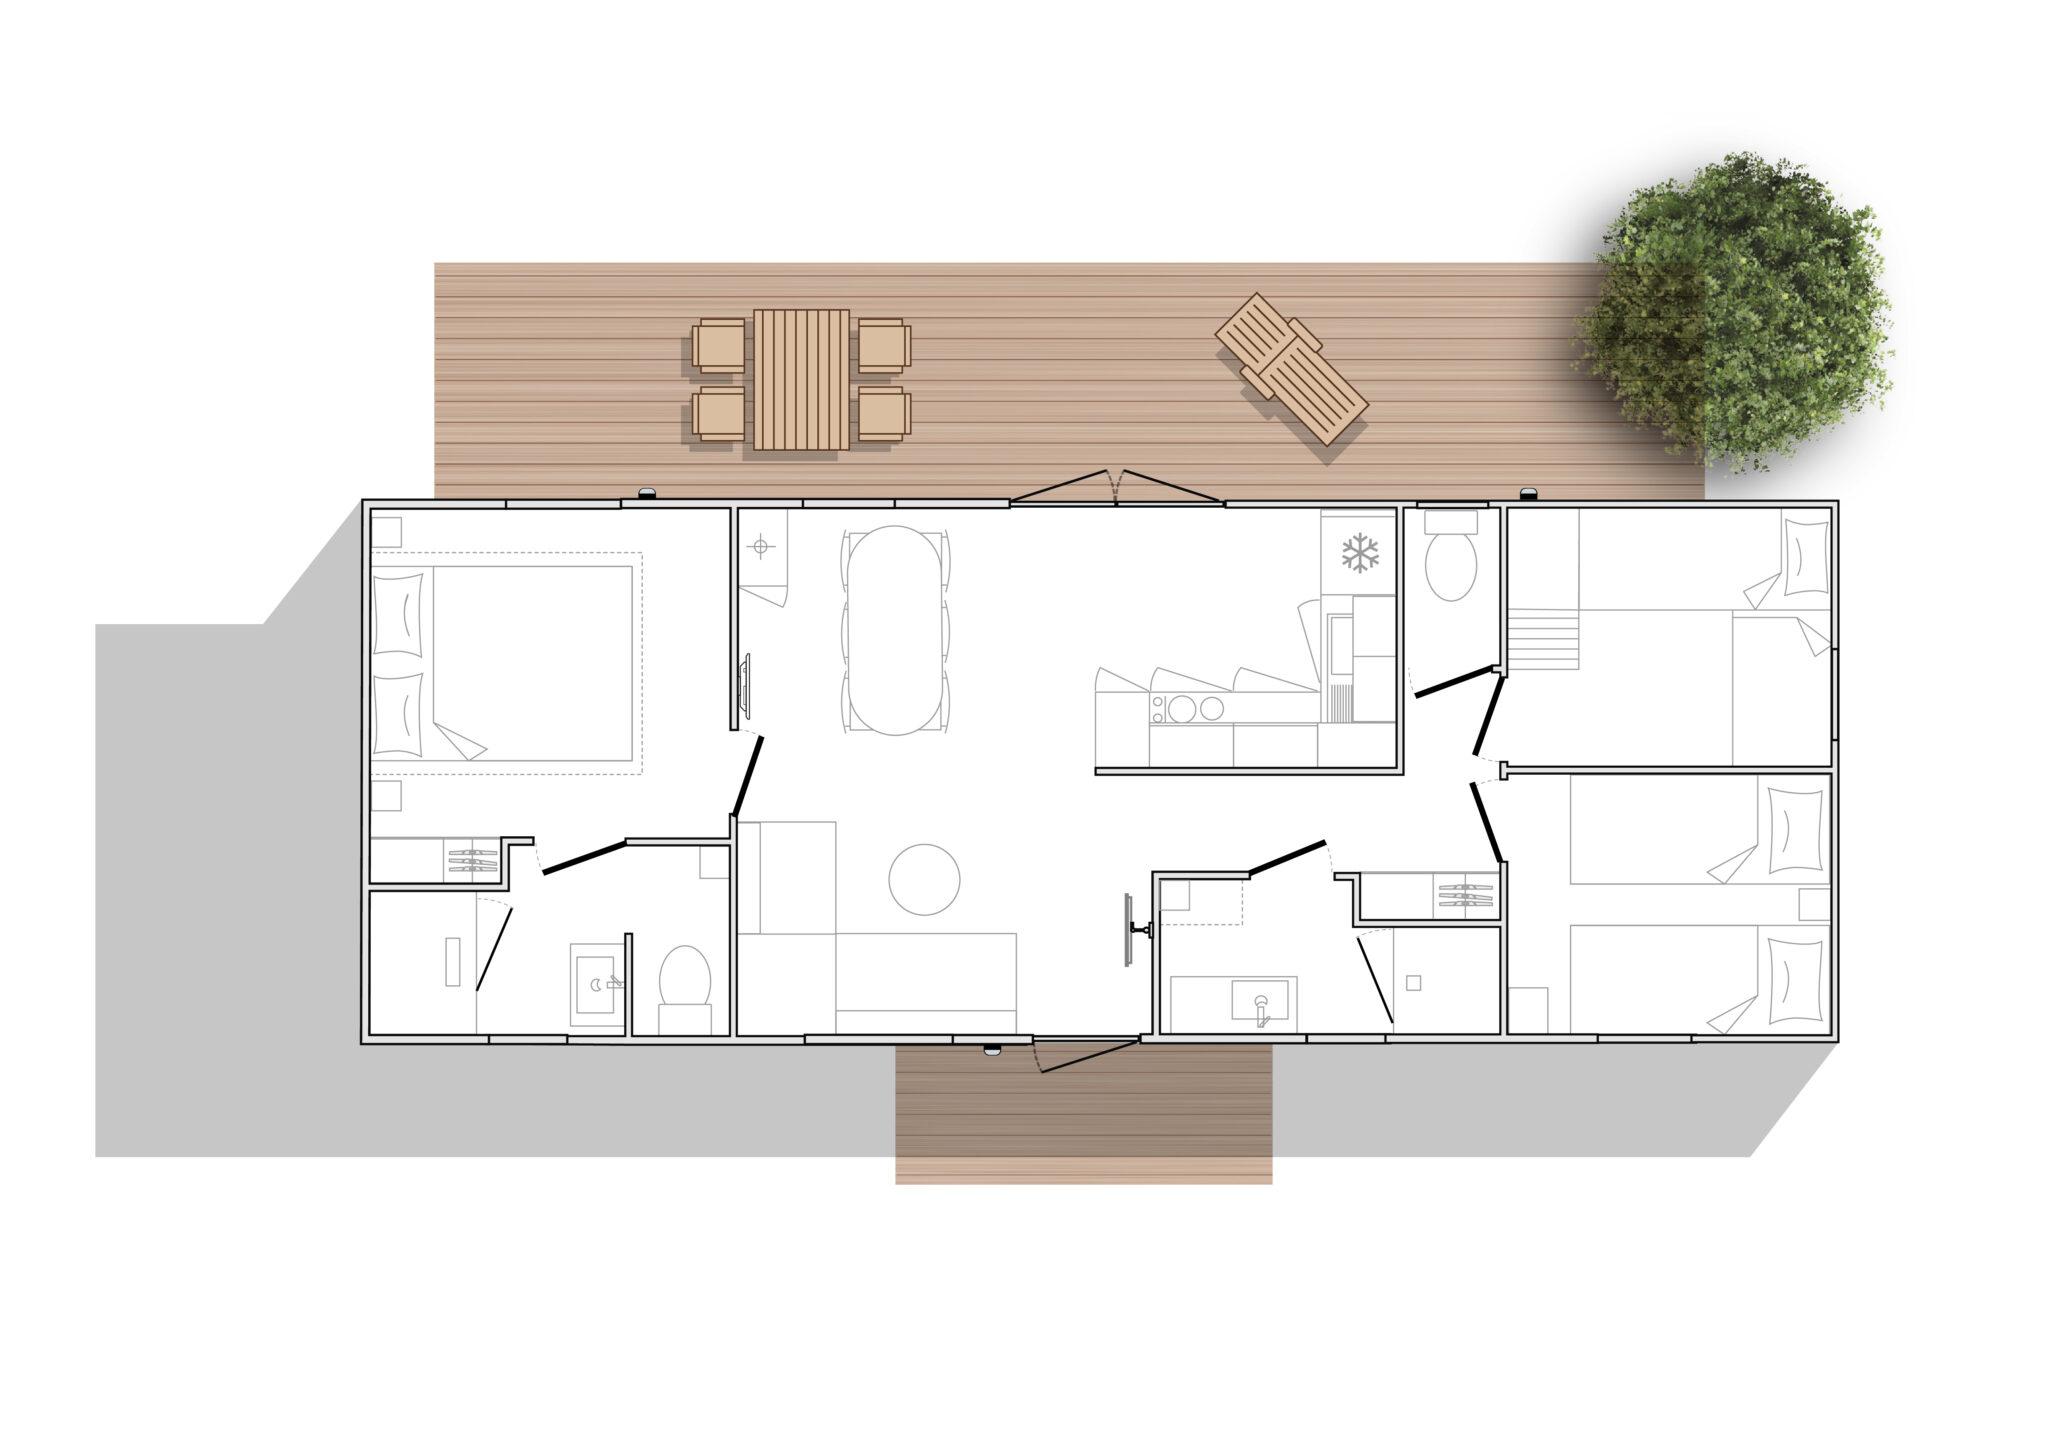 OHARA 1064 côté Jardin - Mobil home Neuf - Zen Mobil homes